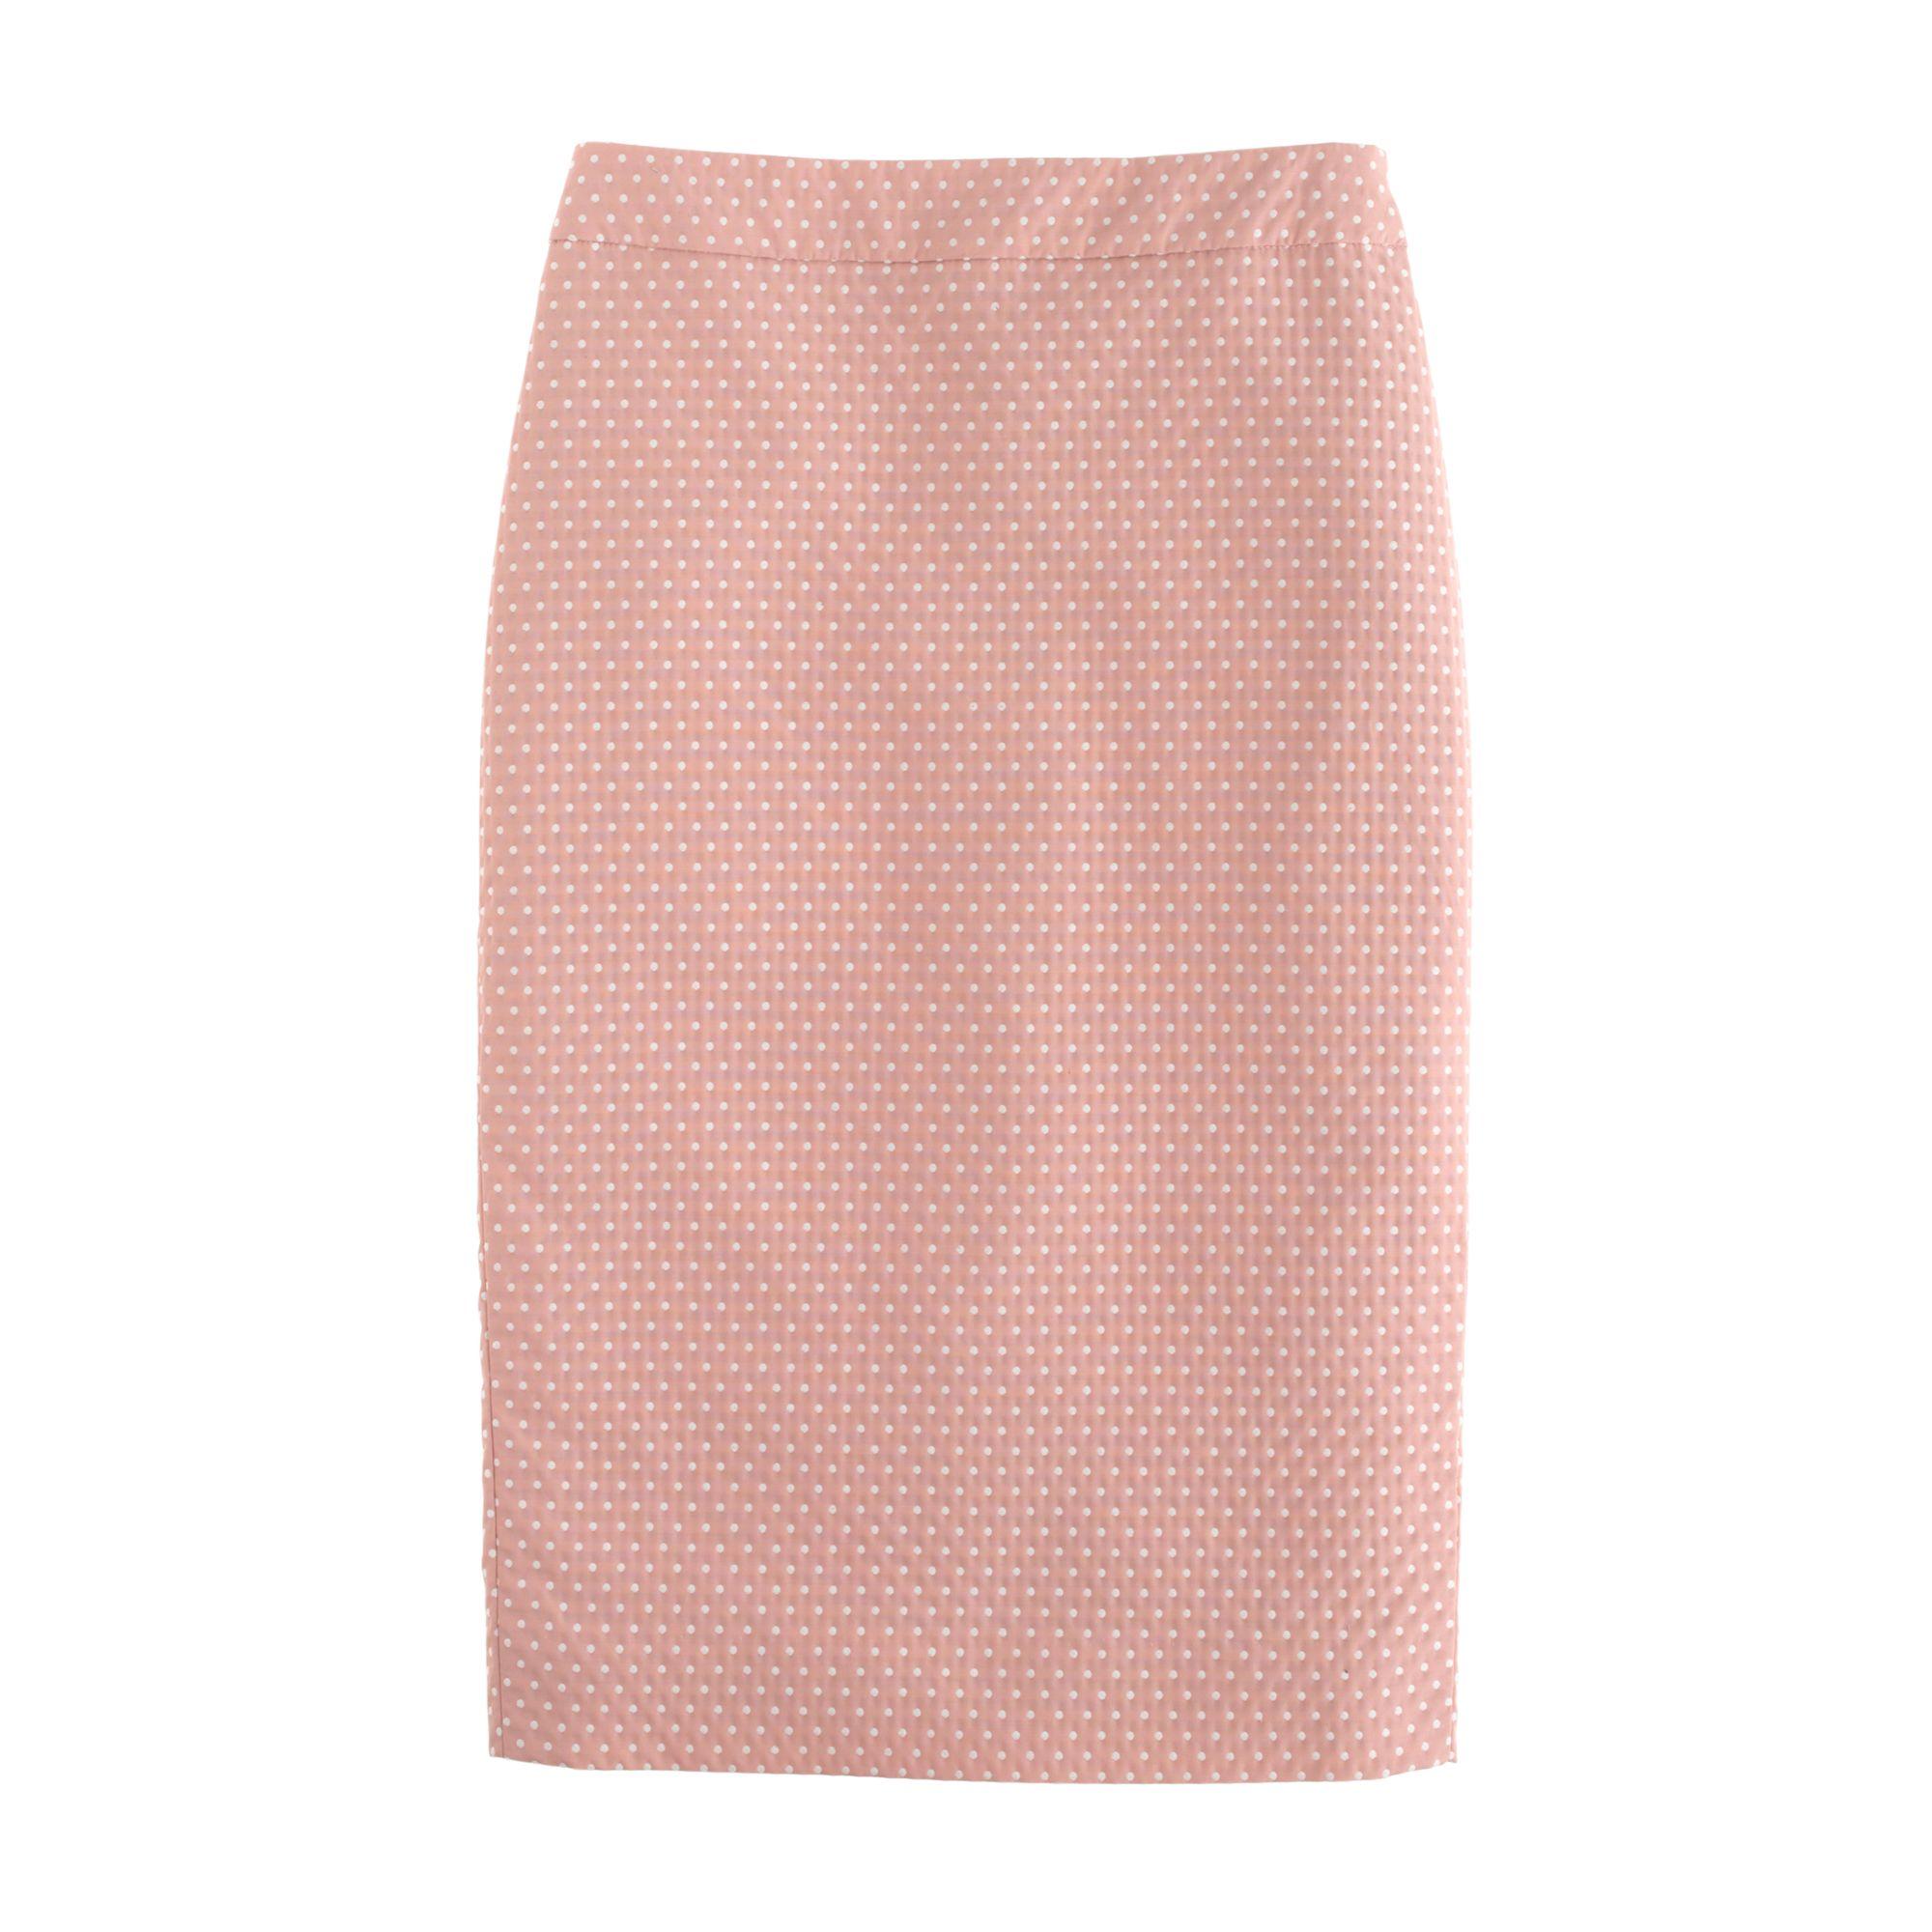 Blush Pink Pencil Skirt | Gommap Blog